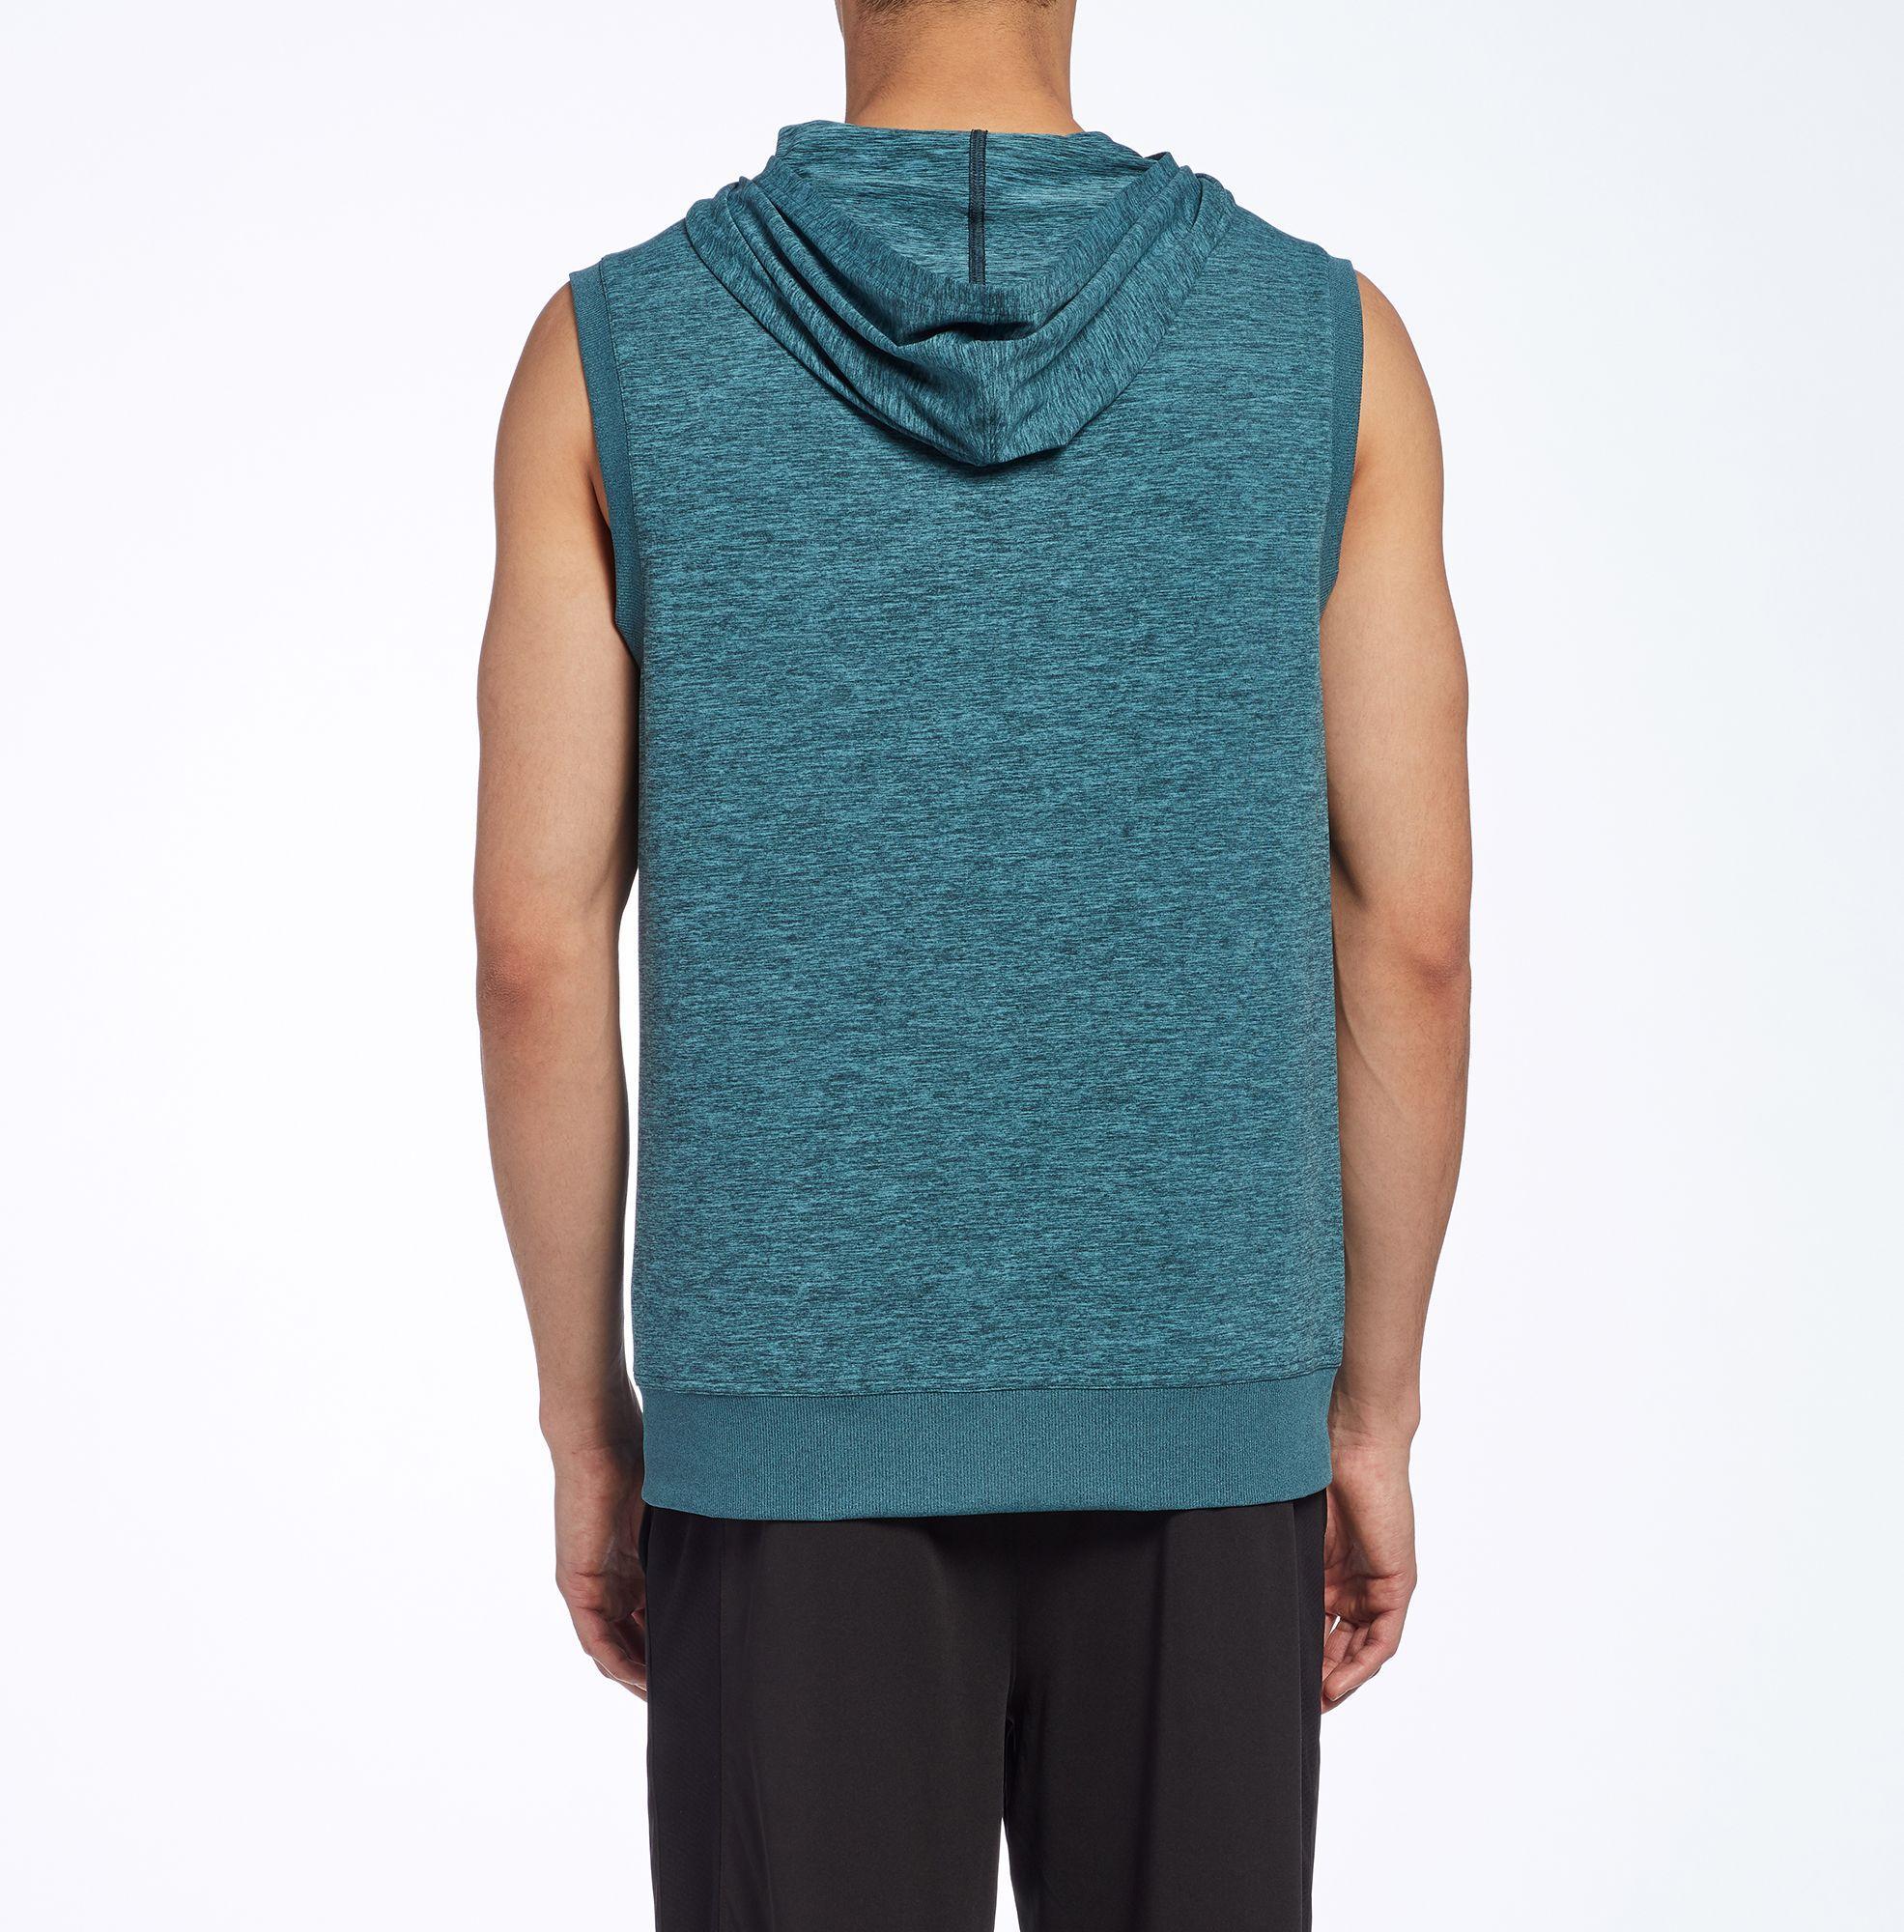 94ae34117e7bd Lyst - Reebok 24 7 Jersey Sleeveless Hoodie in Blue for Men